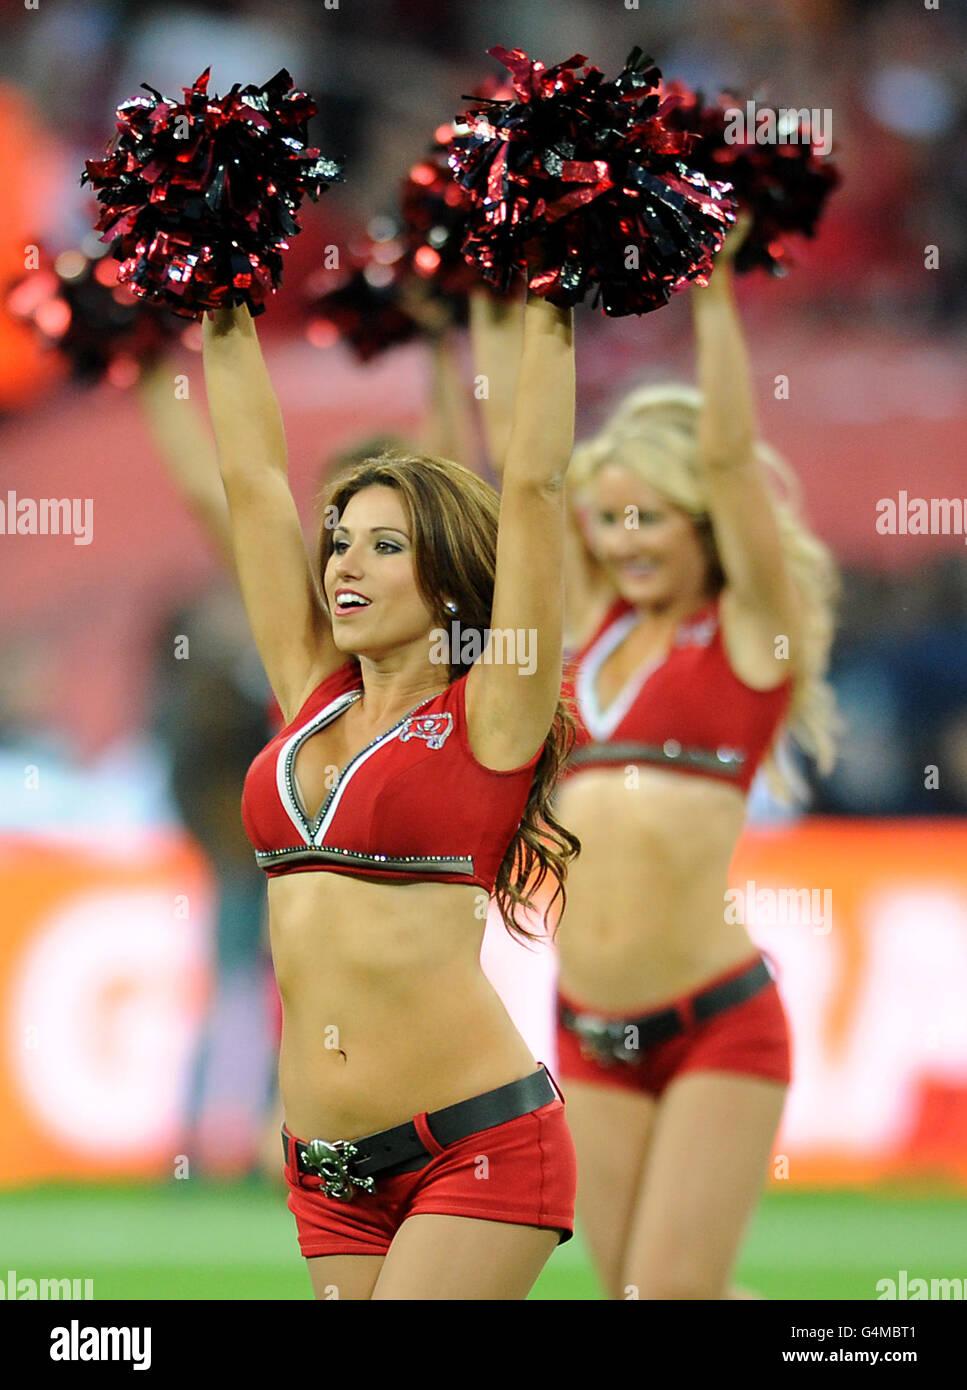 San Francisco 49ers Cheerleaders 2011